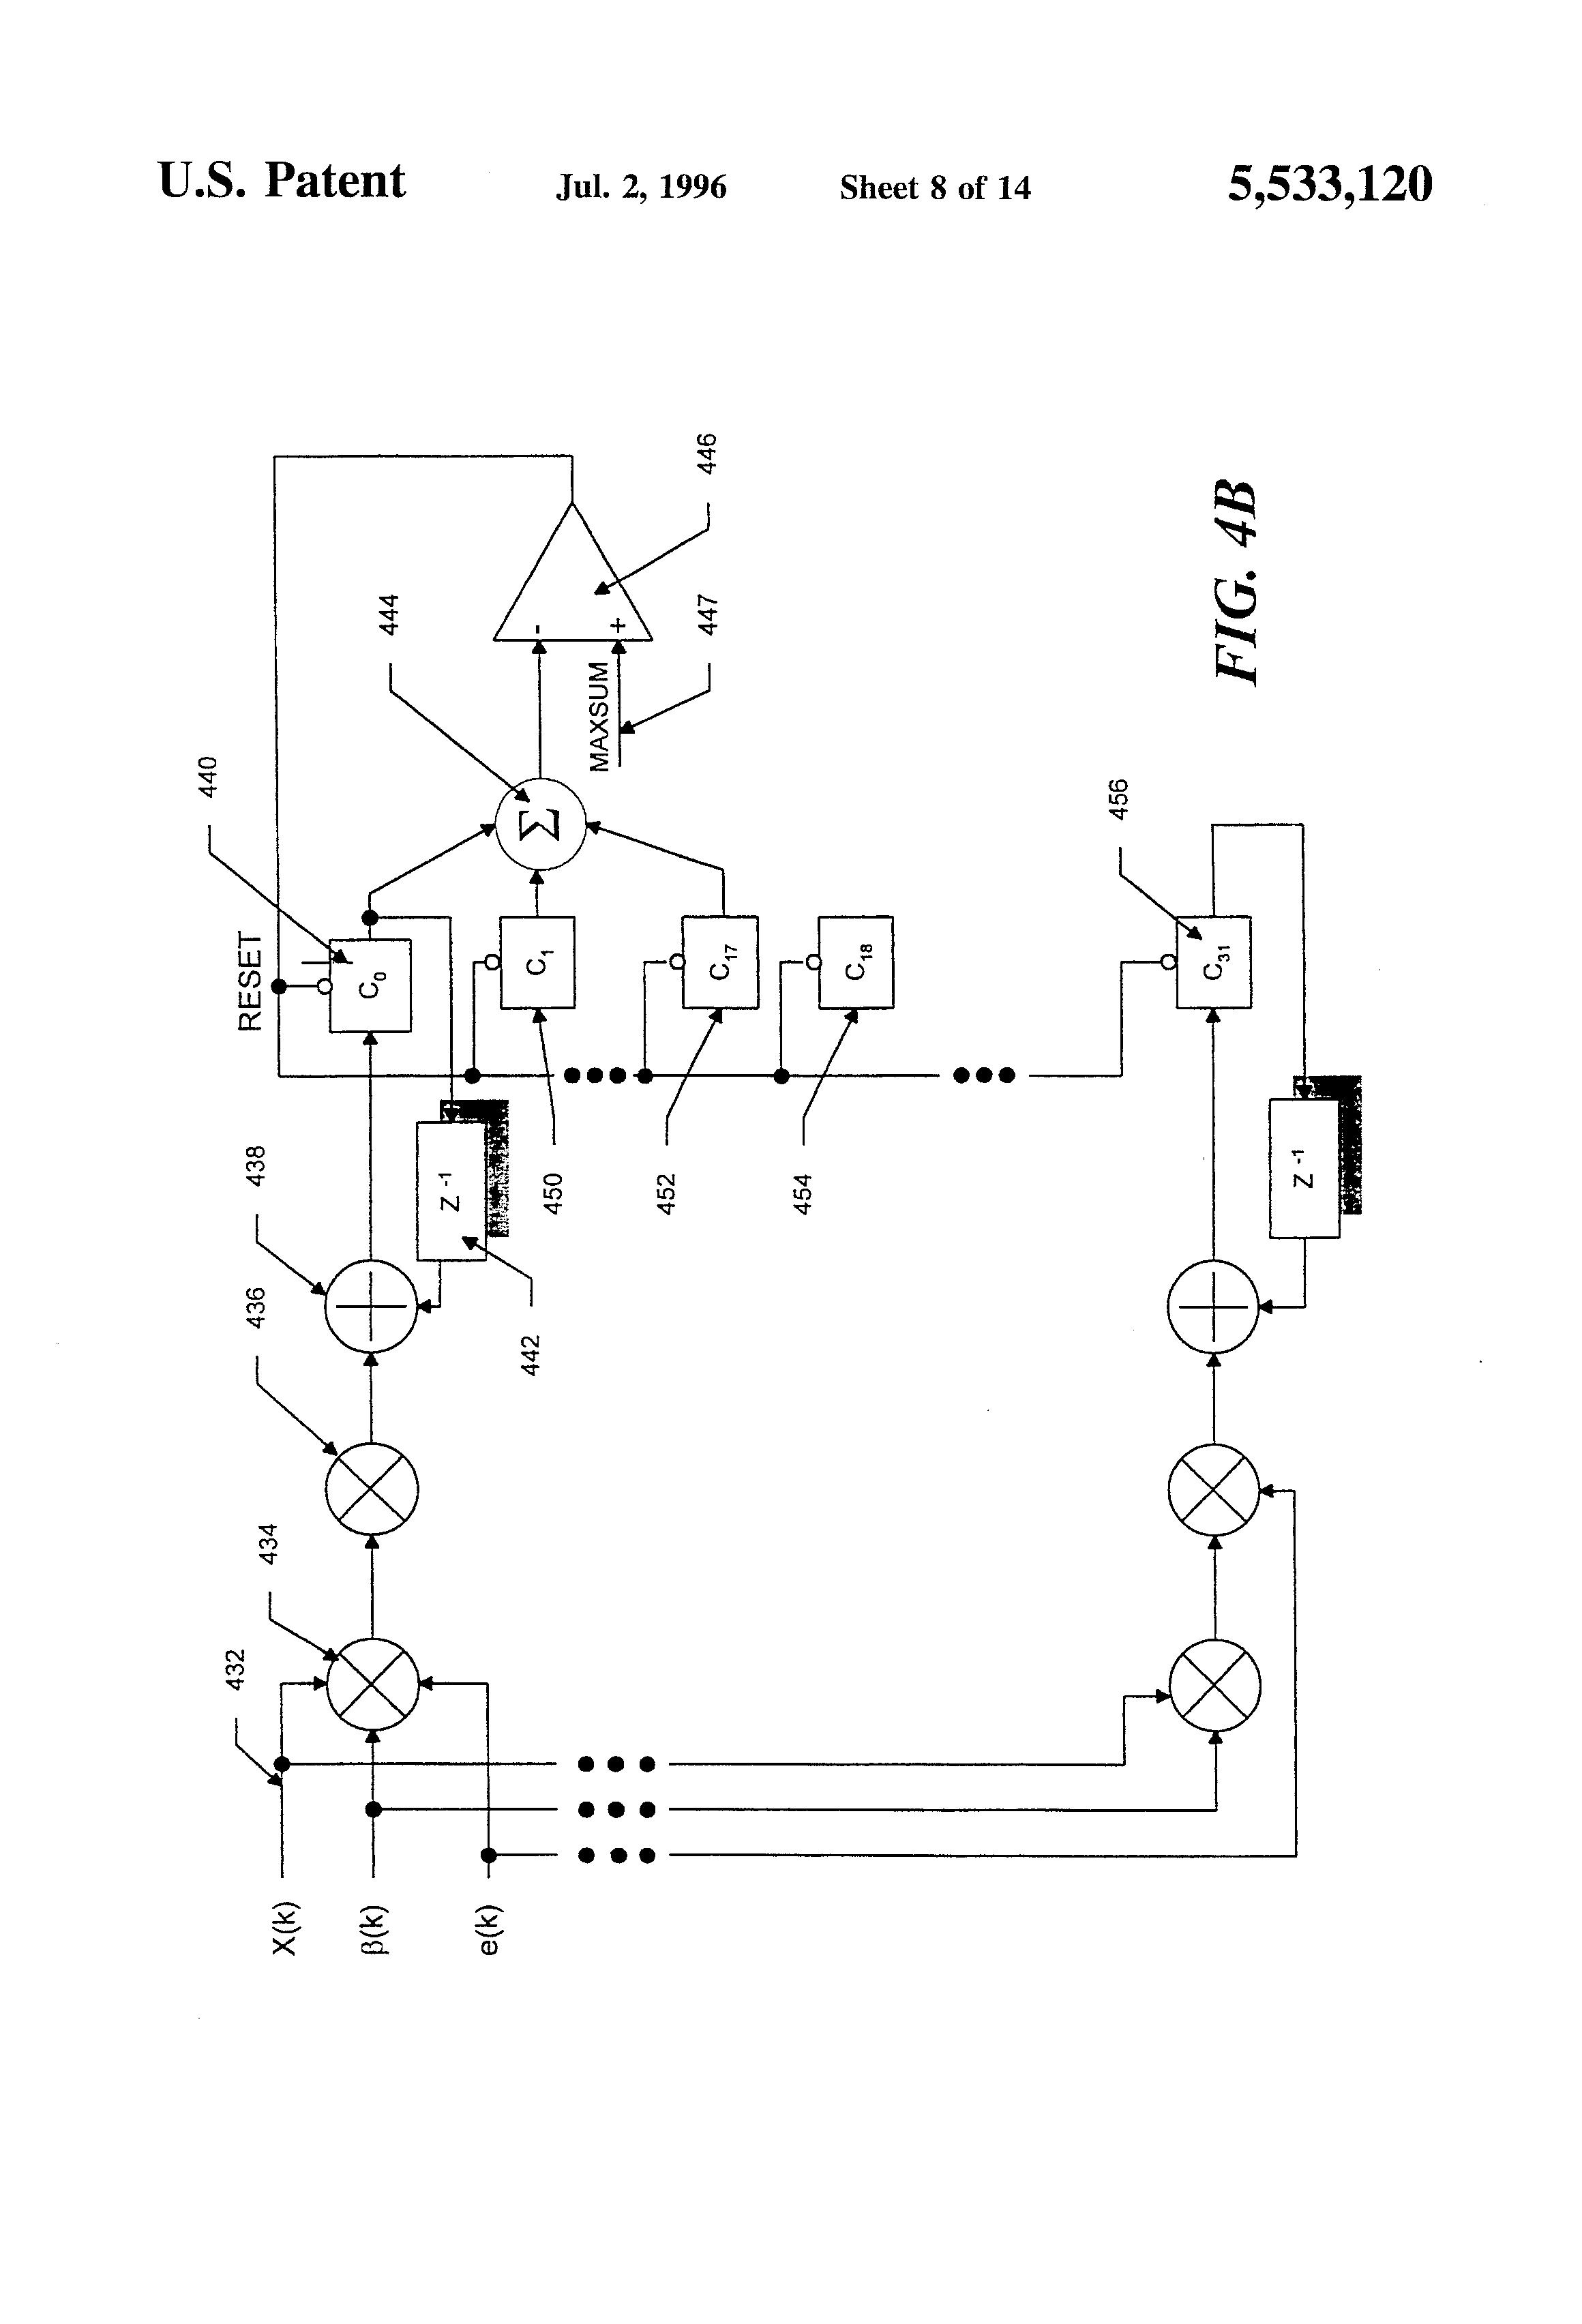 Shure Sm57 Wiring Diagram - Page 3 - Wiring Diagram And Schematics